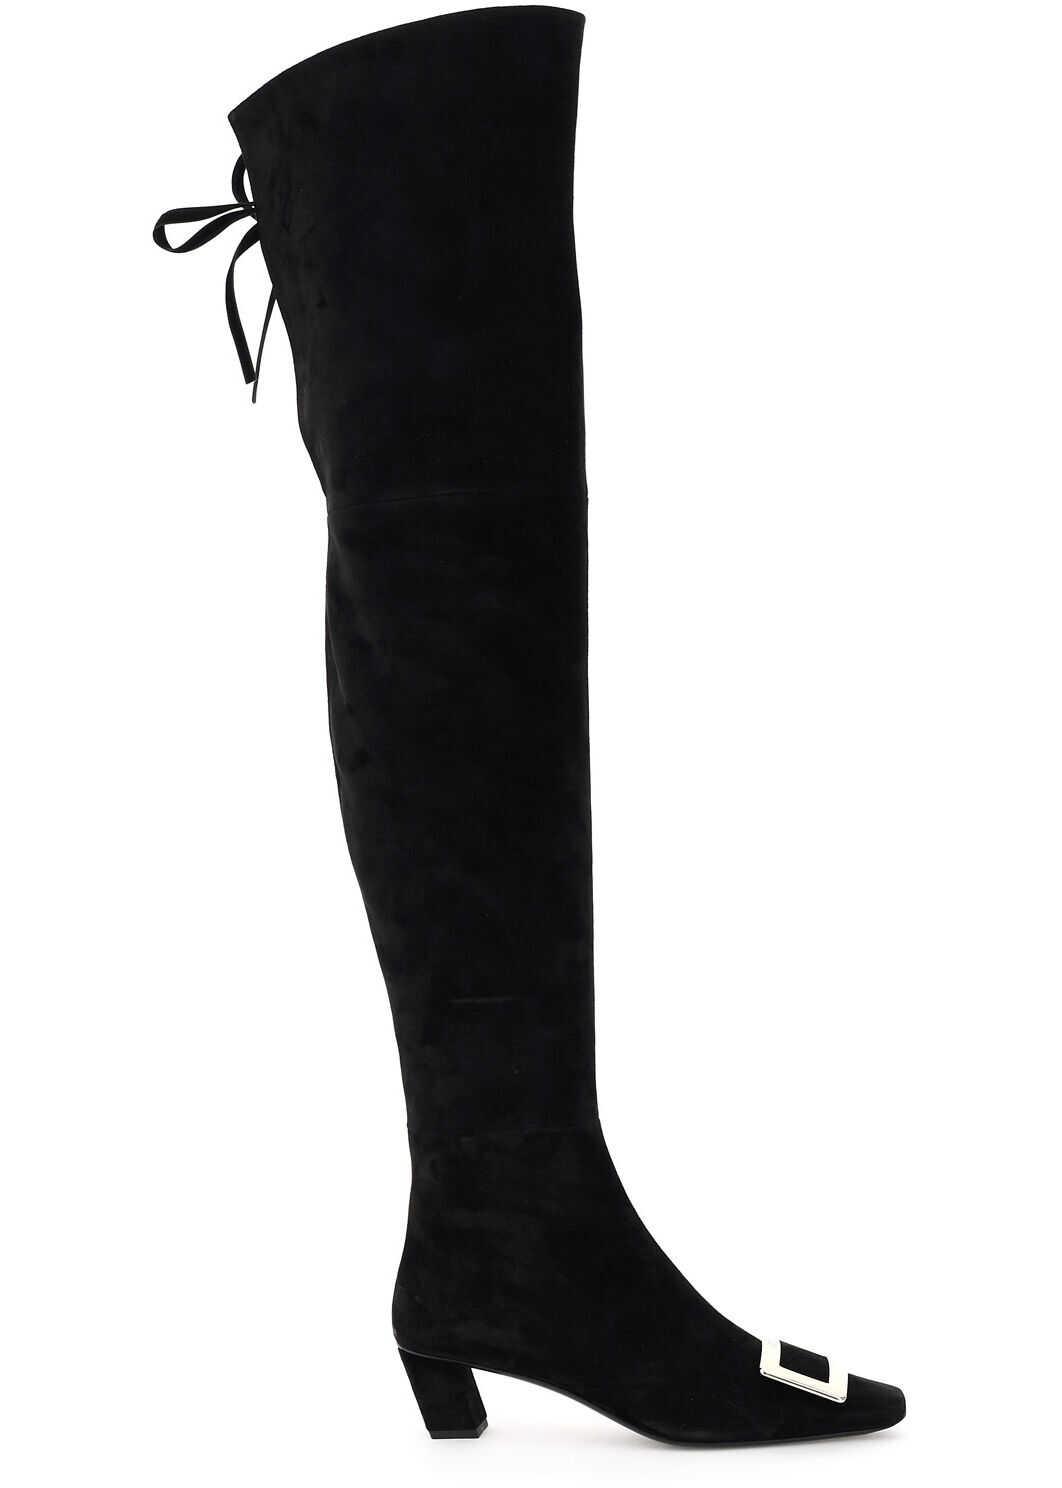 Roger Vivier Vivier Suede Over The Knee Belle Boots RVW00630130HR0 NERO imagine b-mall.ro